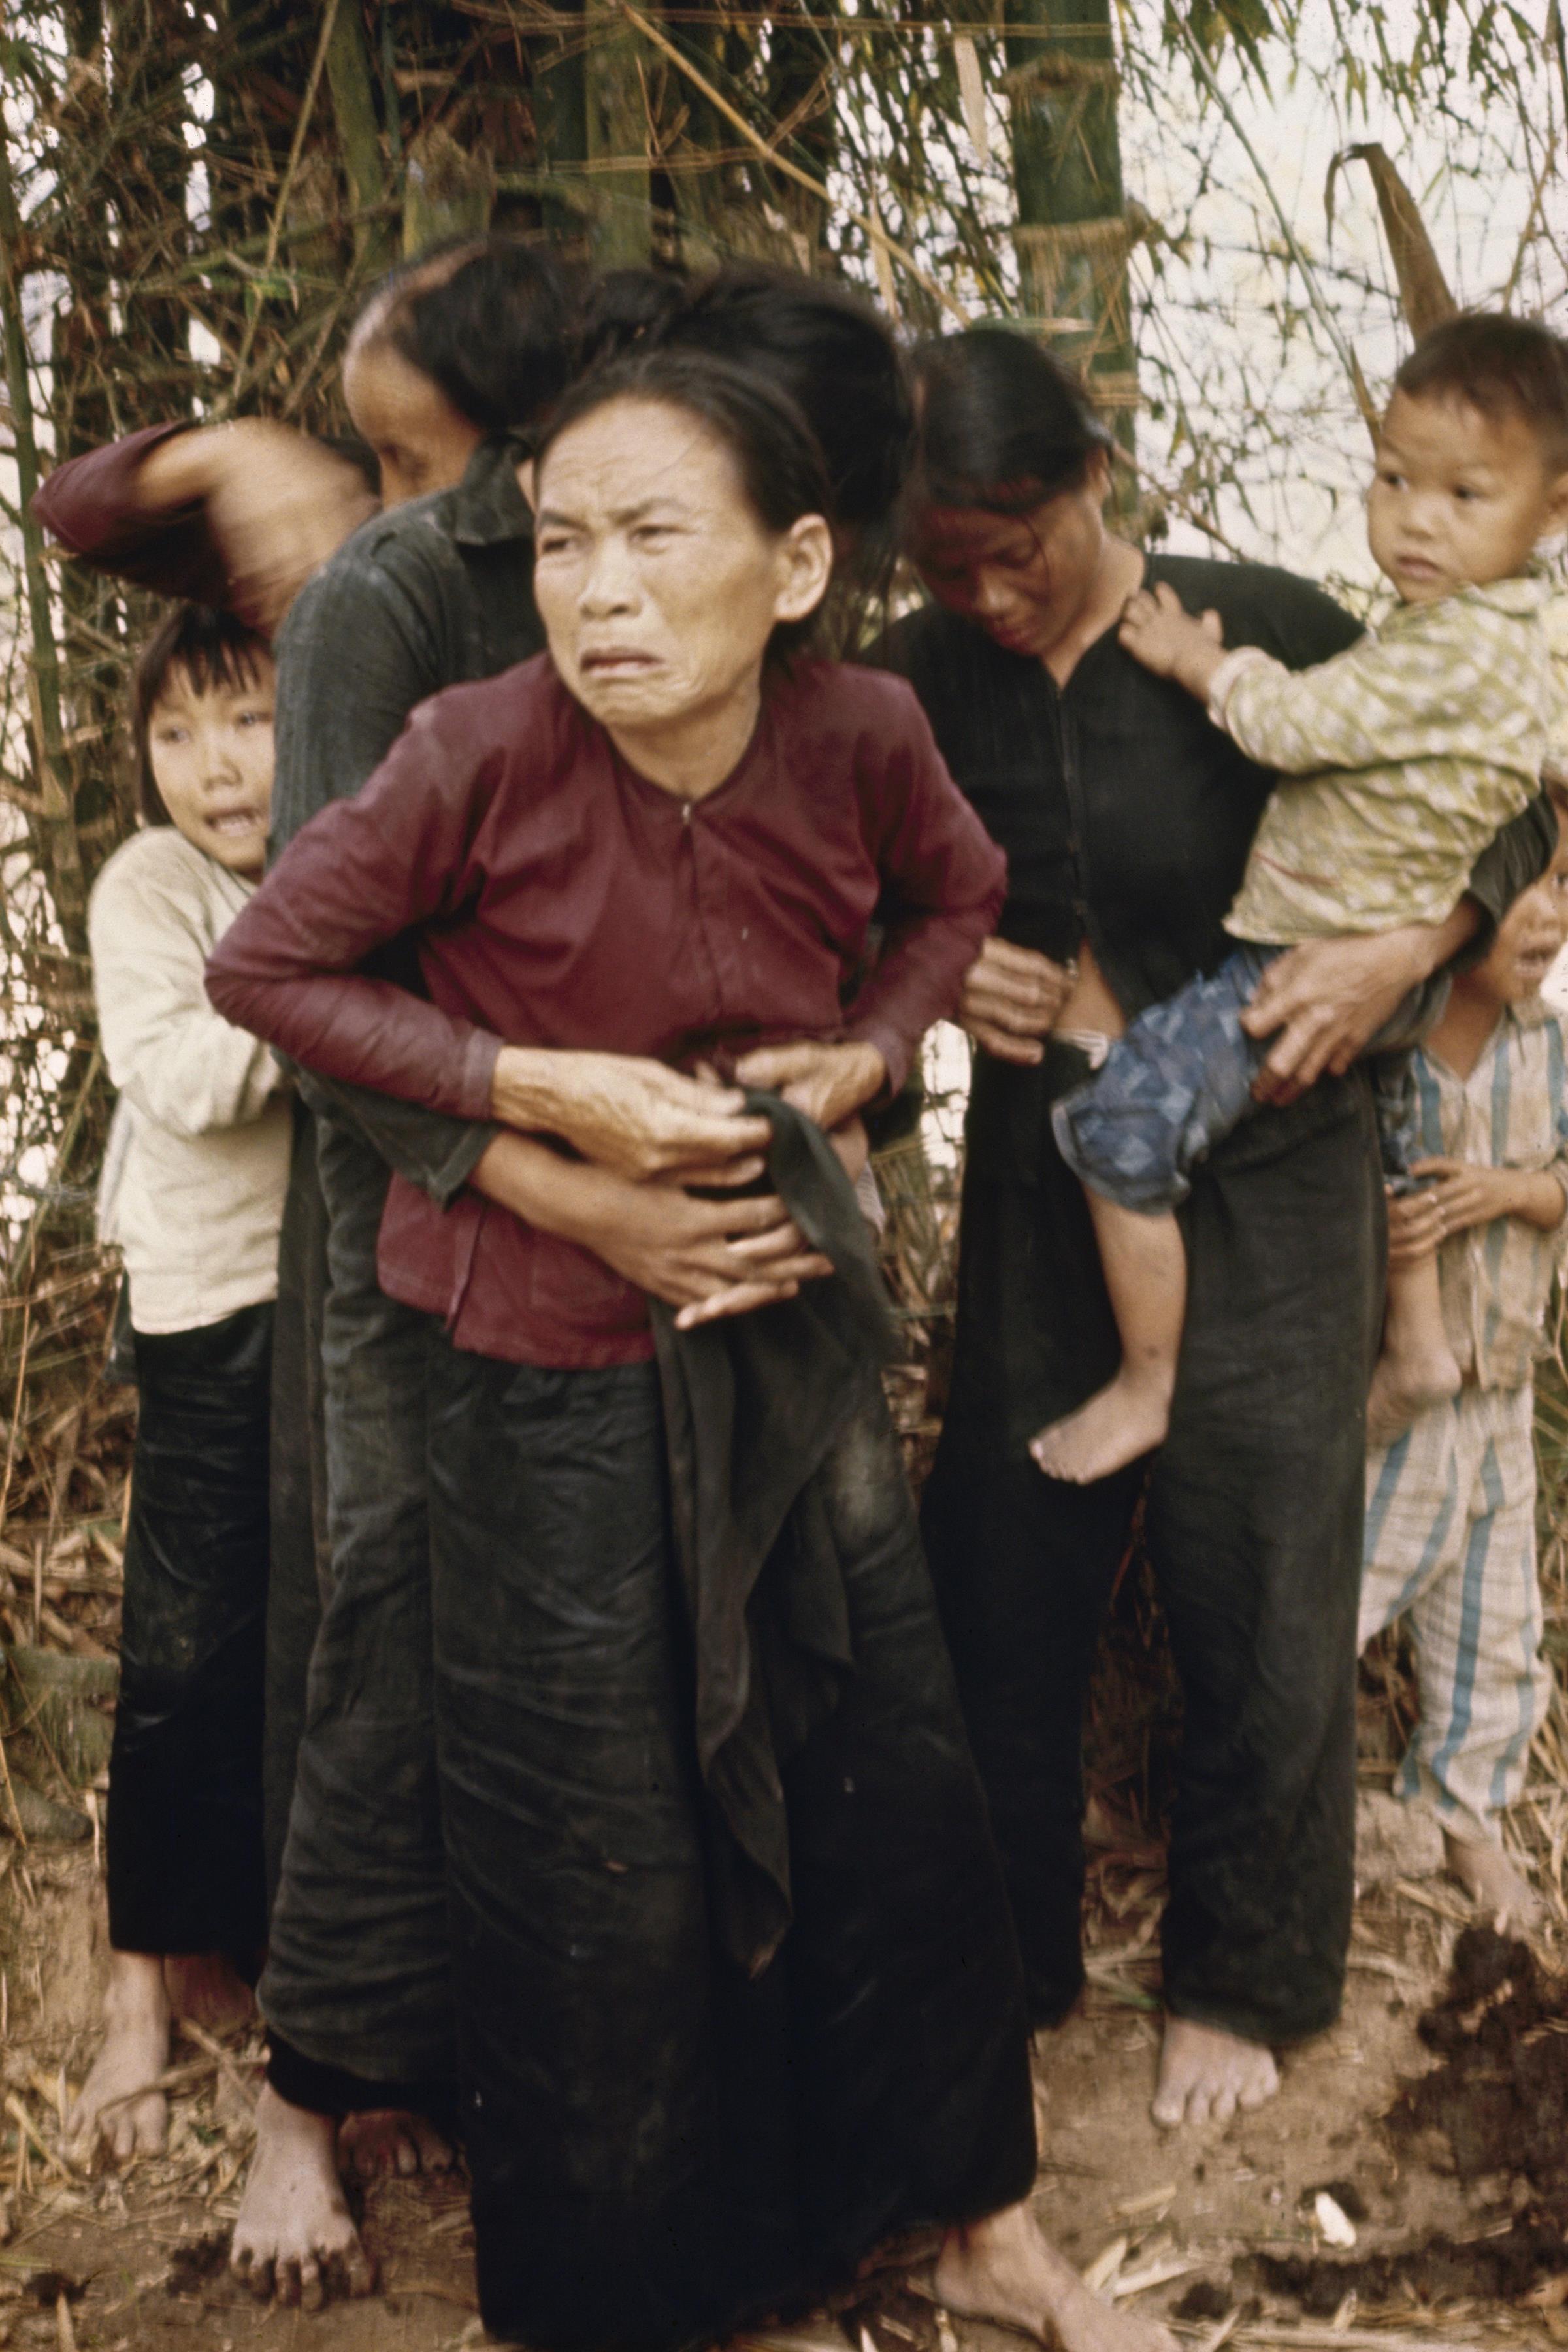 http://upload.wikimedia.org/wikipedia/commons/b/b7/My_Lai_massacre_woman_and_children.jpg